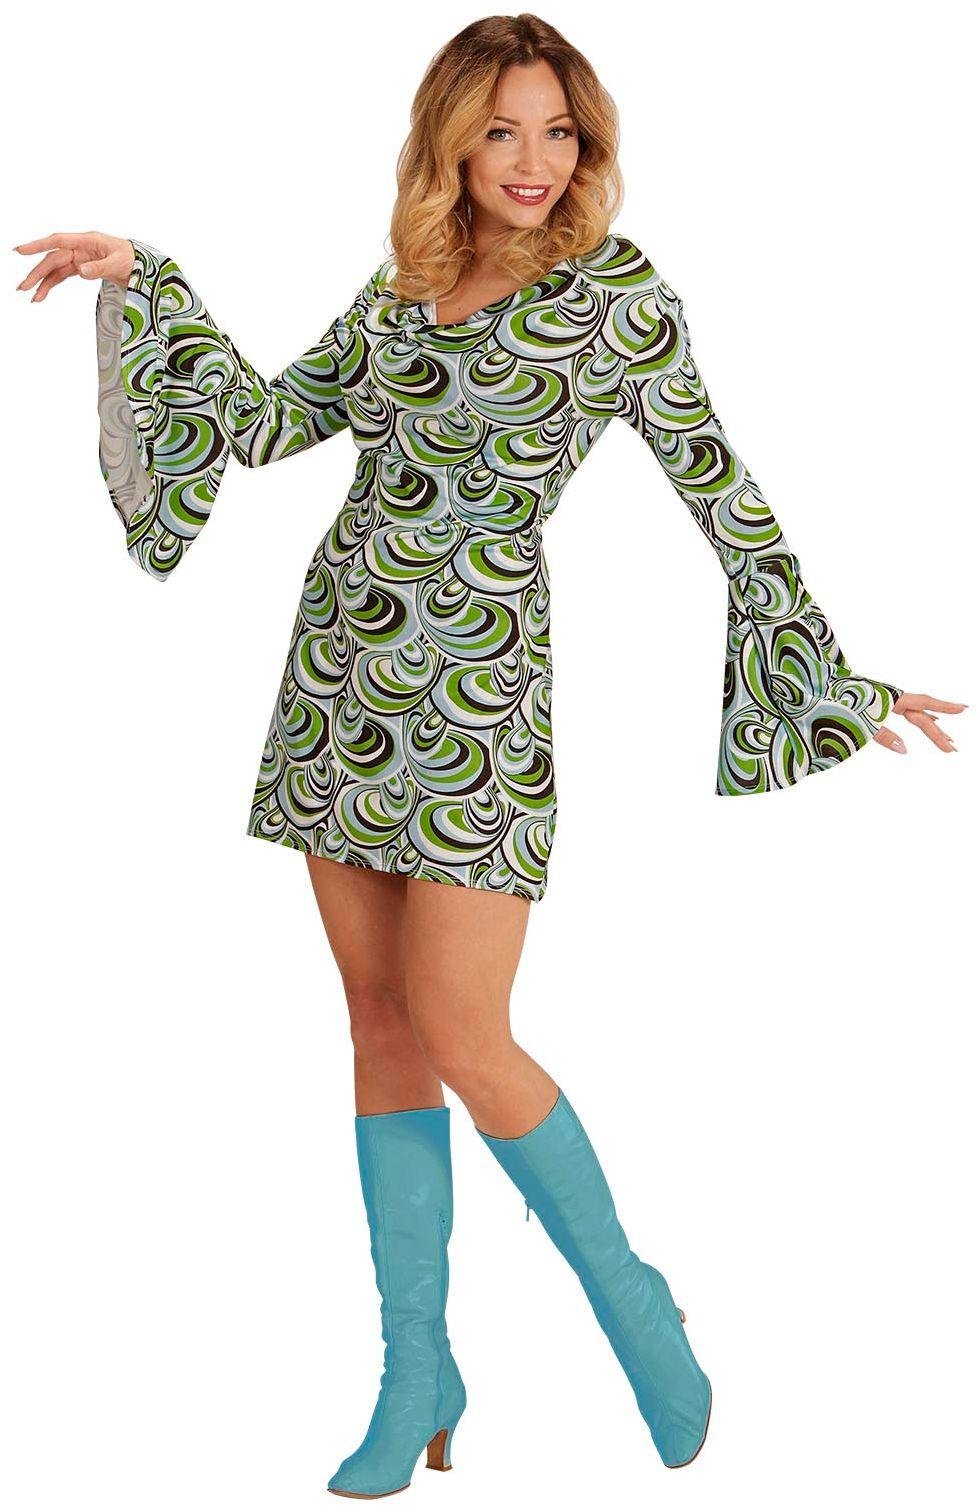 Groovy 70s jurk